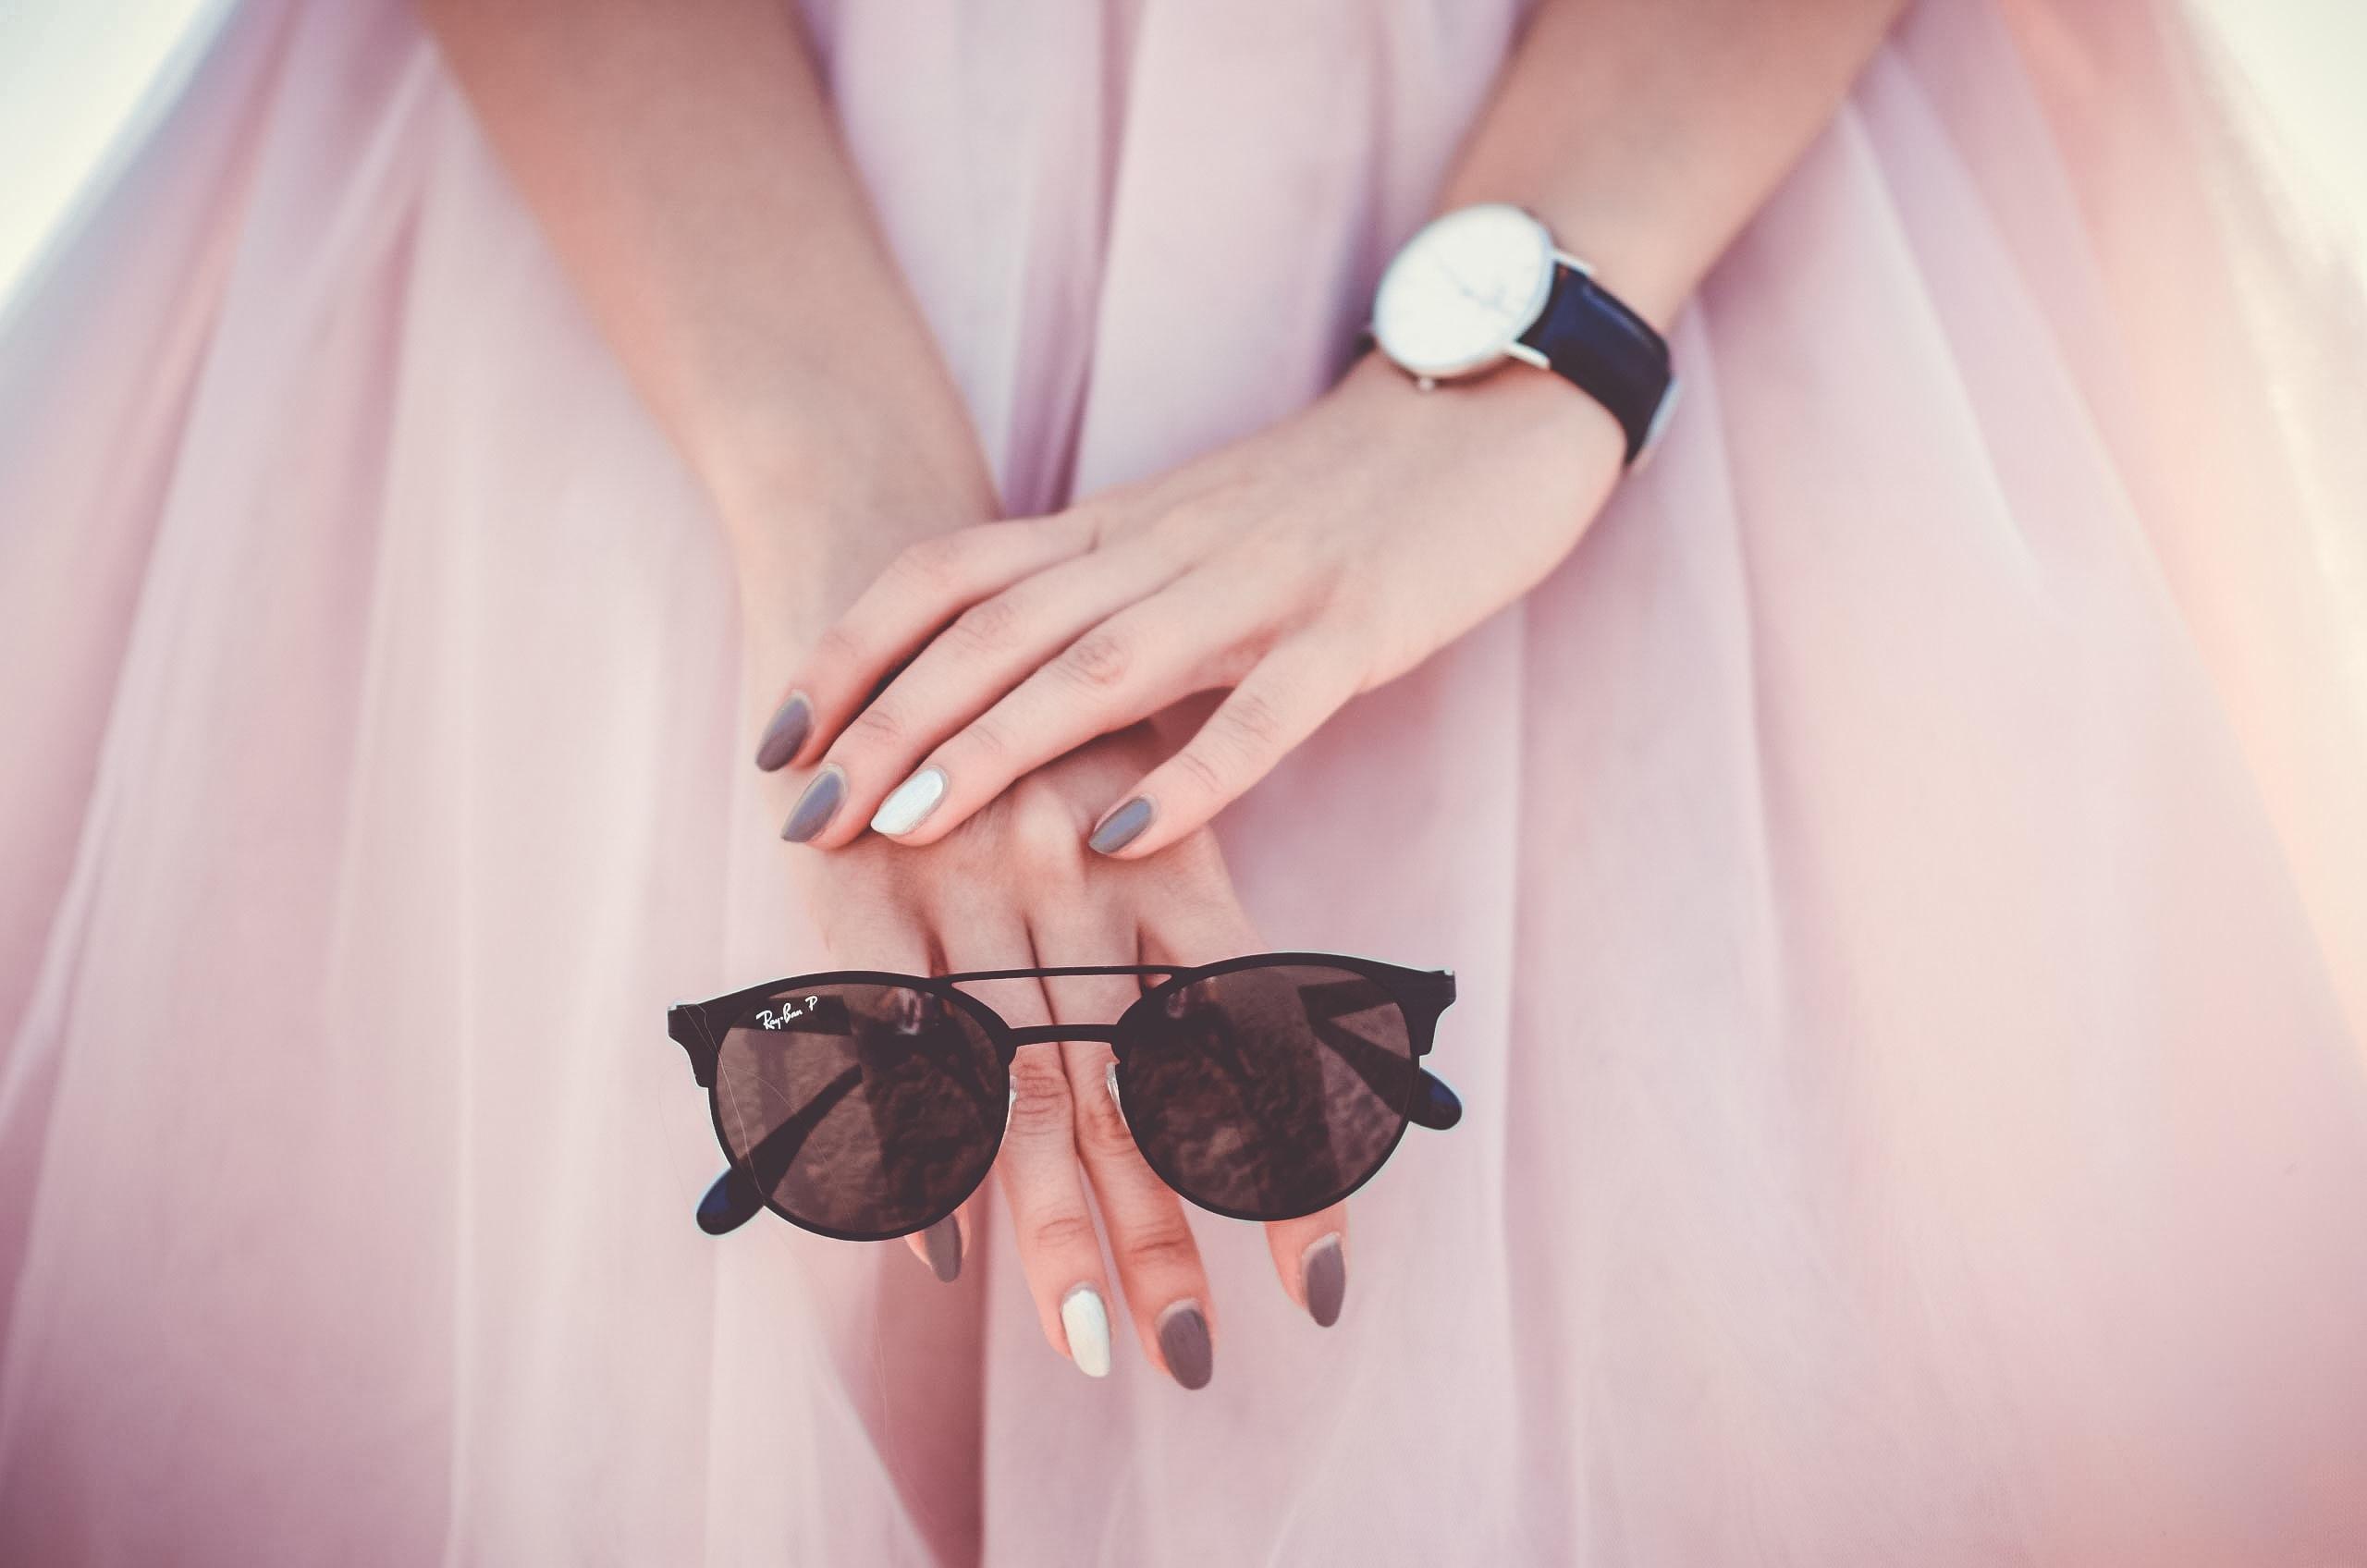 woman holding black Ray-Ban sunglasses